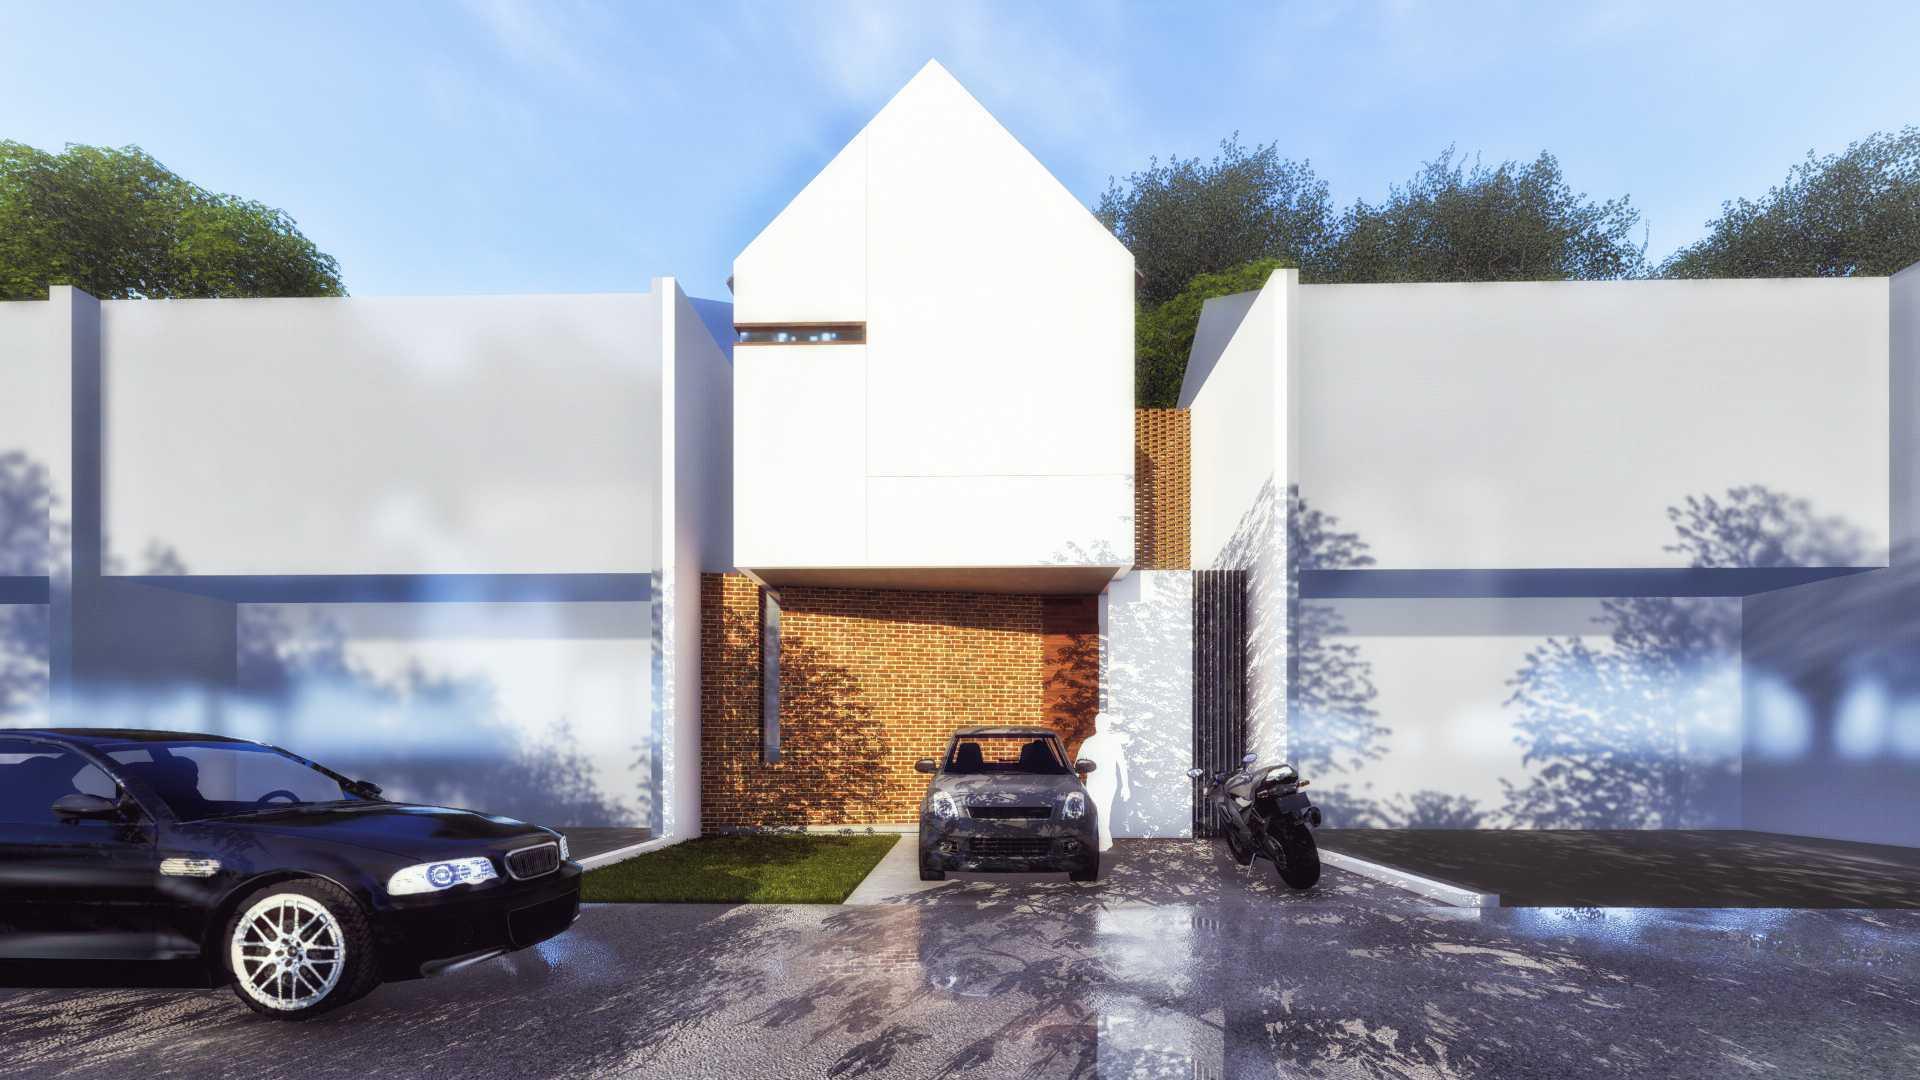 Samitrayasa Design Rumah Jagakarsa (Opsi 1) Jagakarsa, Kota Jakarta Selatan, Daerah Khusus Ibukota Jakarta, Indonesia Jagakarsa, Kota Jakarta Selatan, Daerah Khusus Ibukota Jakarta, Indonesia Samitrayasa-Design-Rumah-Jagakarsa-Opsi-1  60839